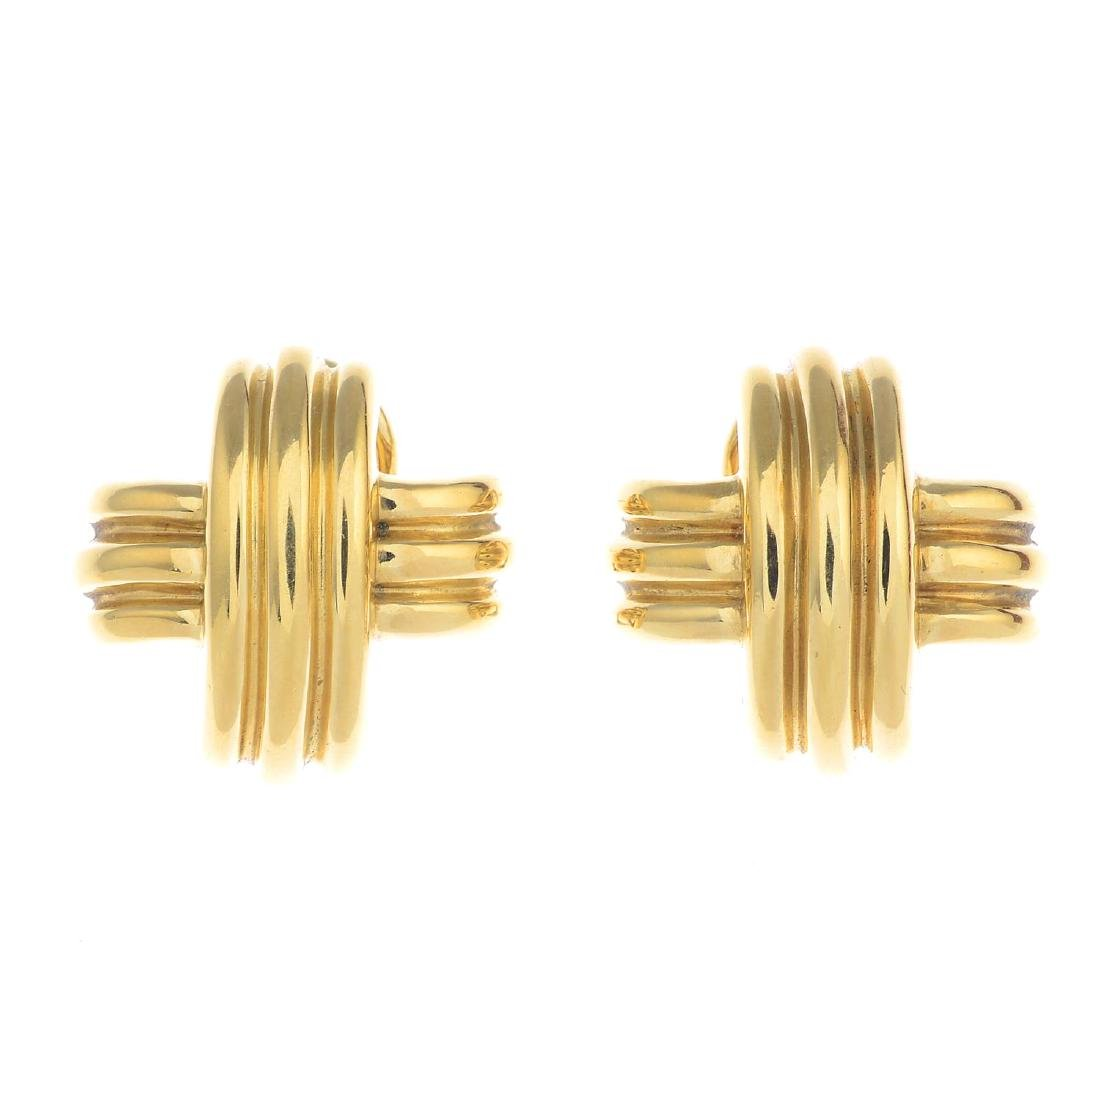 TIFFANY & Co. - a pair of cross earrings. Each designed